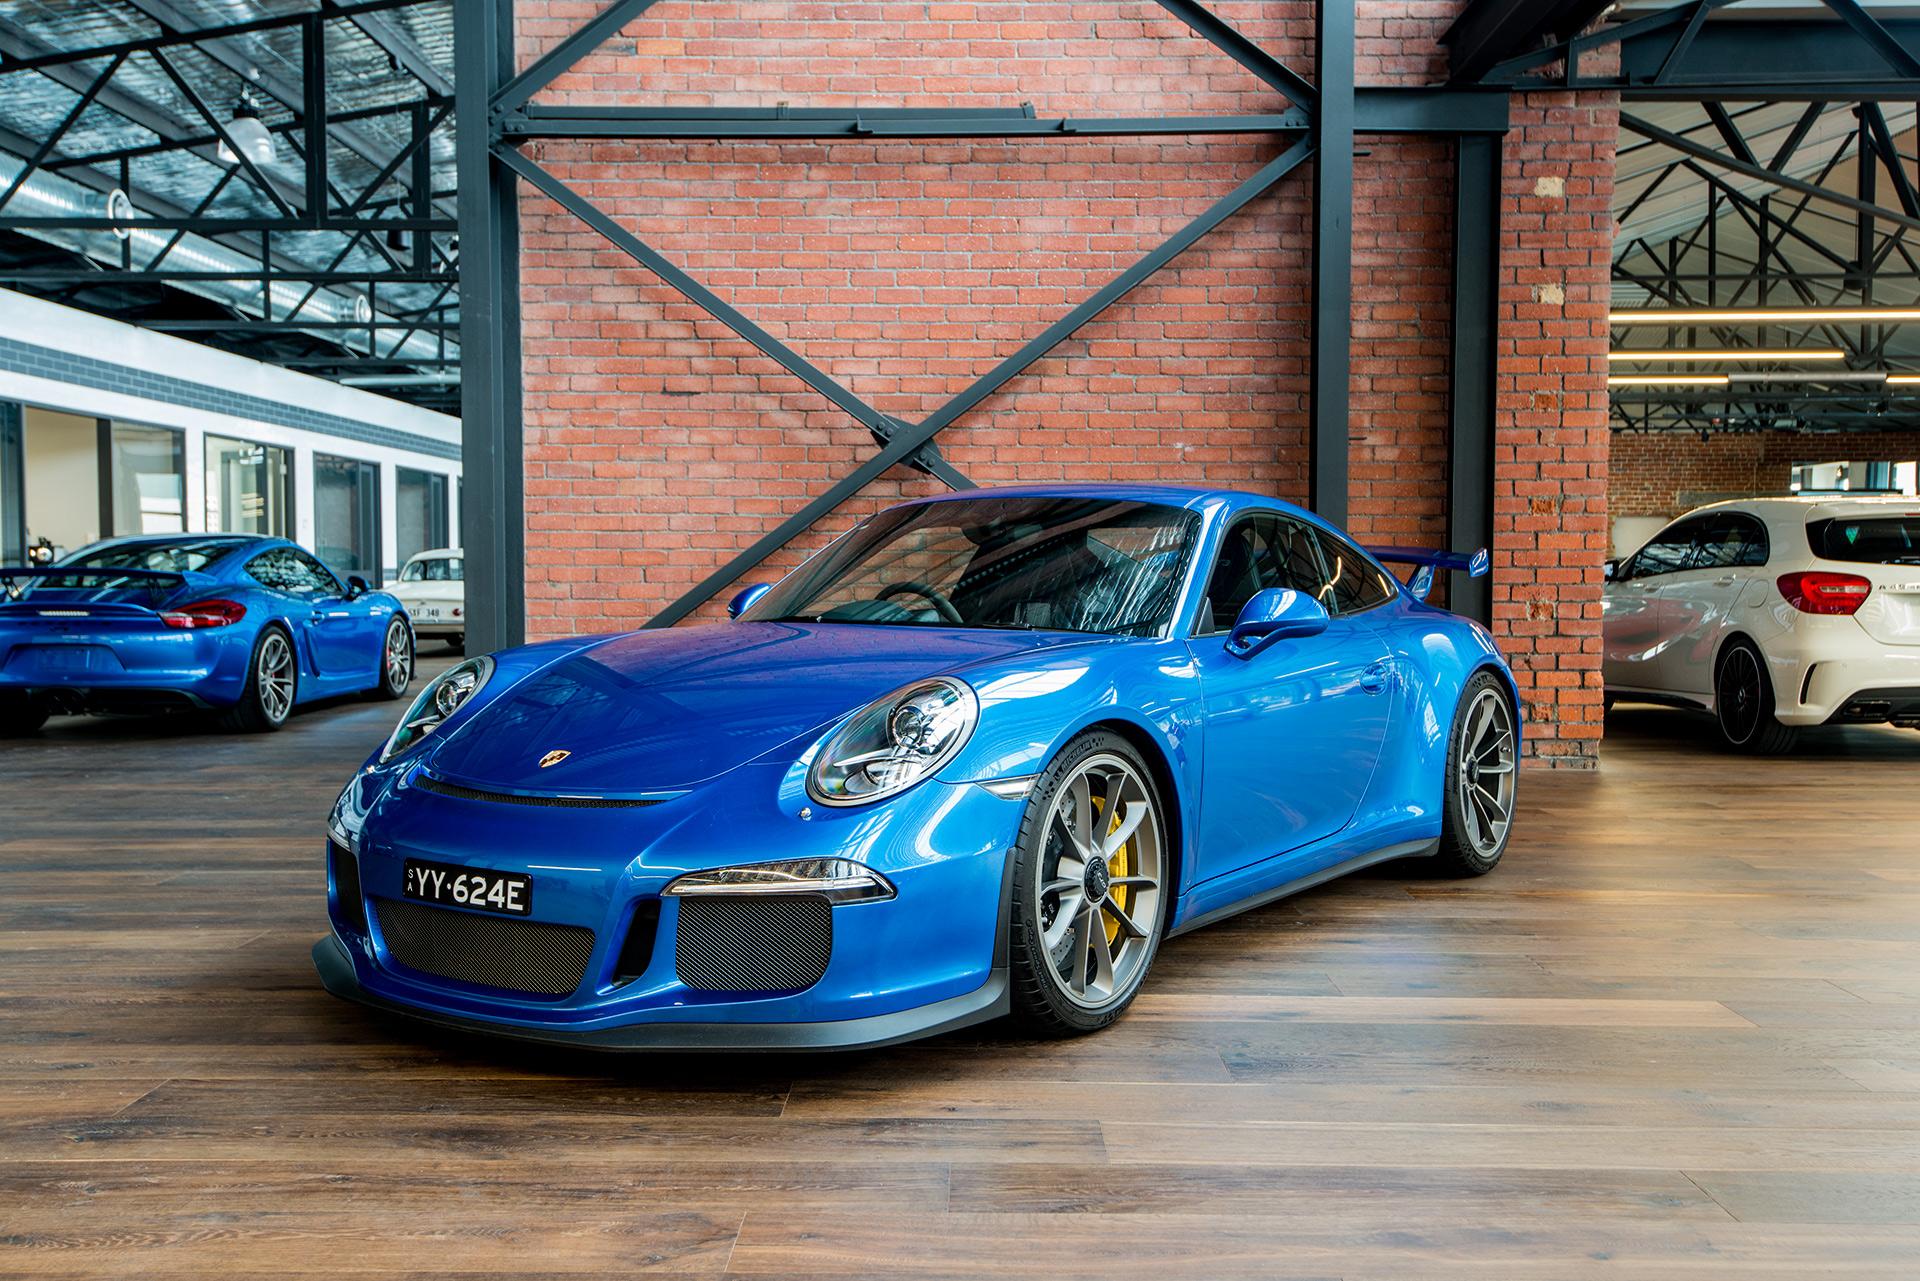 2013 Porsche Gt3 Club Sport My14 Richmonds Classic And